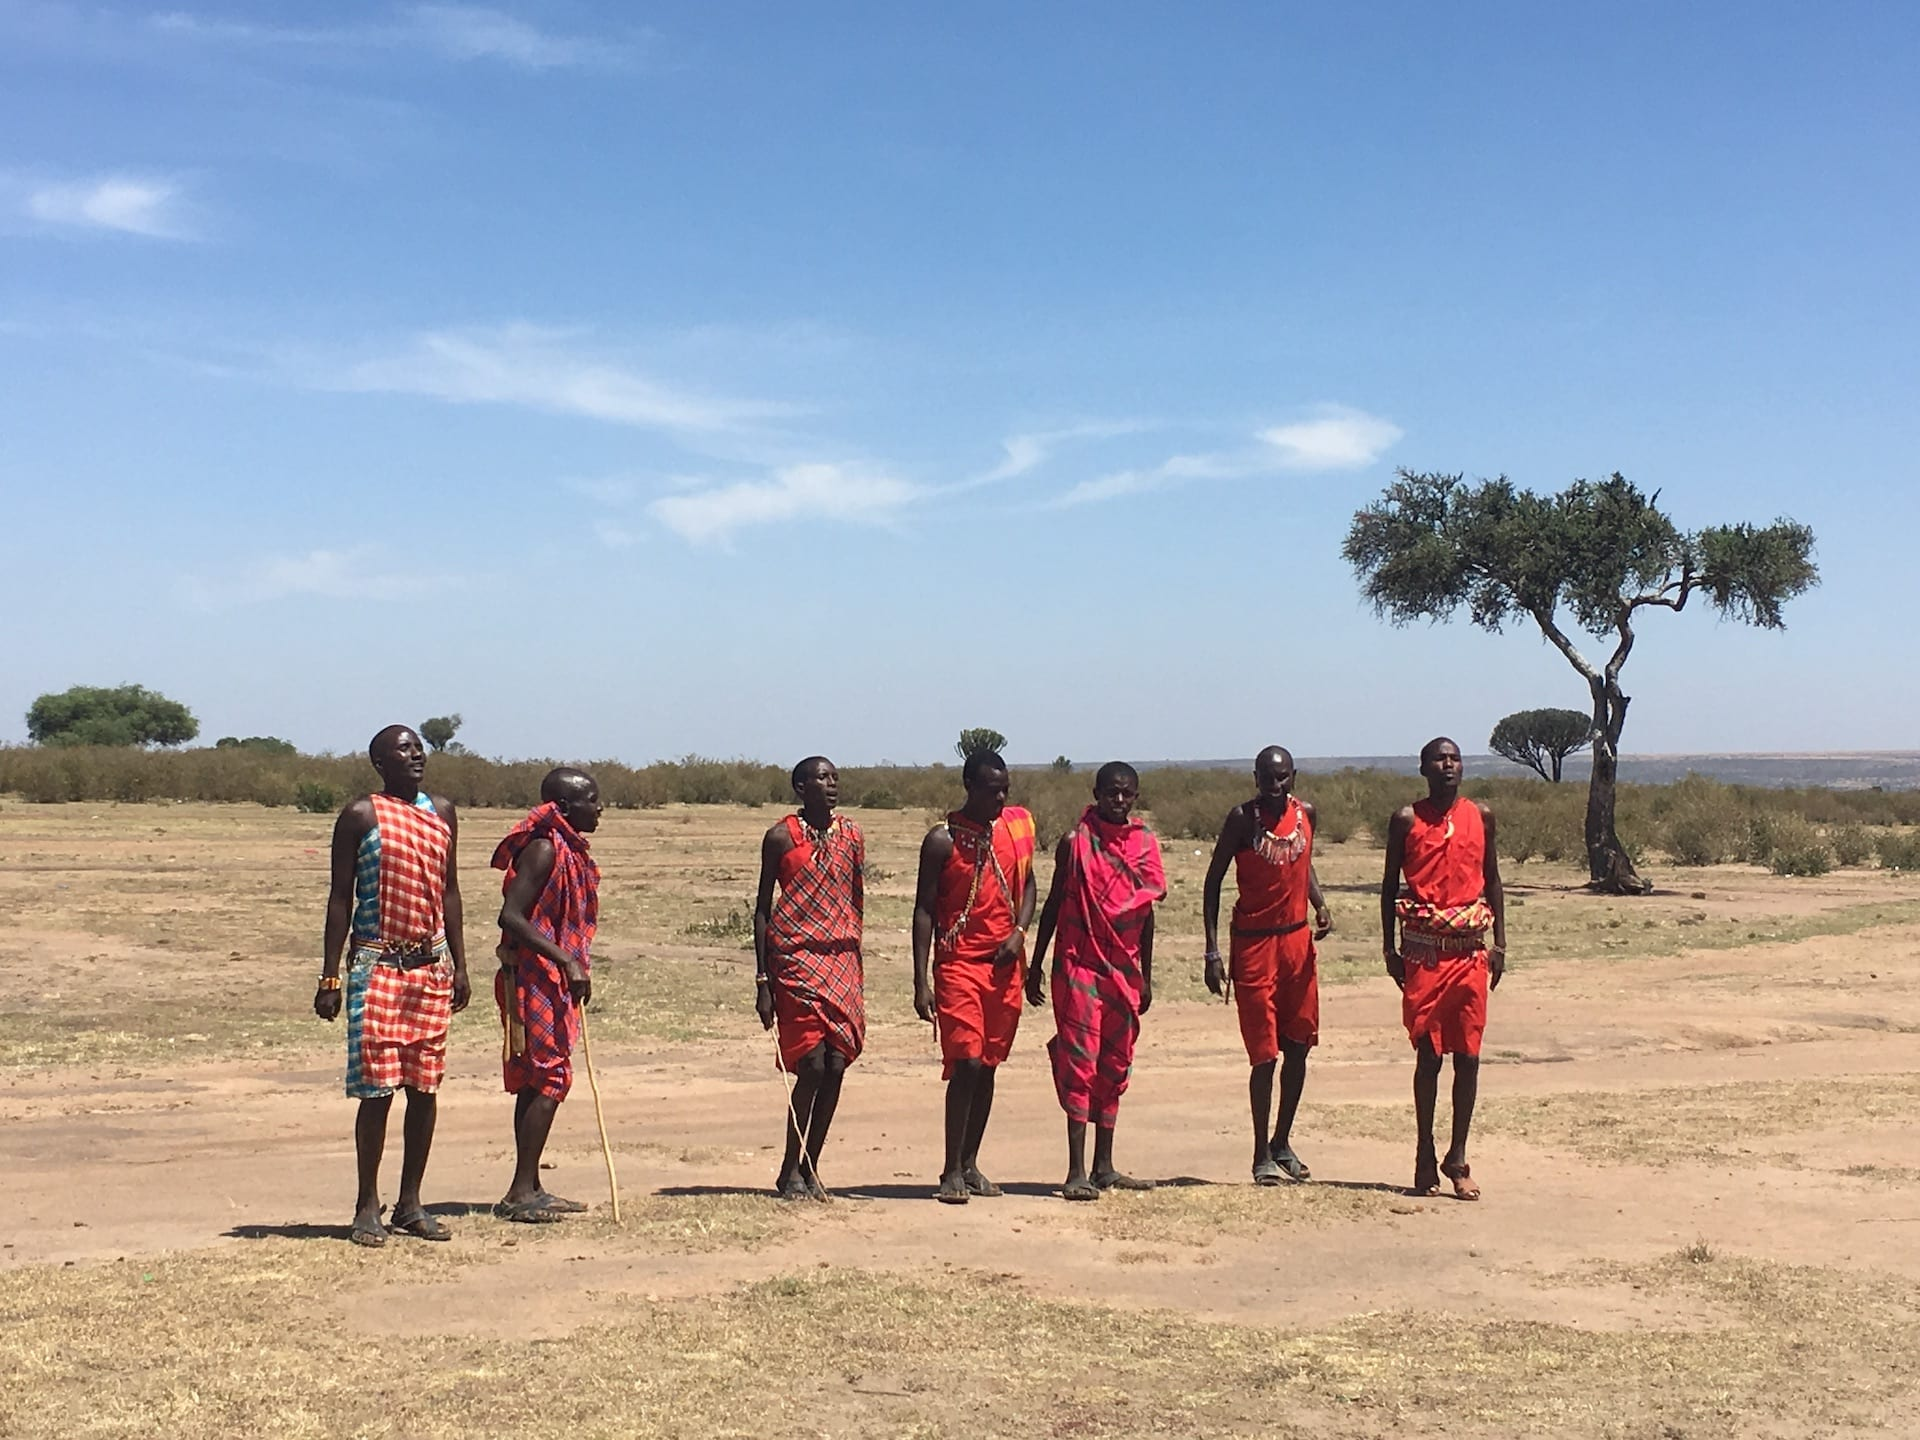 OVERIGE LANDEN - ALGEMEEN - Kenia - mensen Masai - IMG_2945